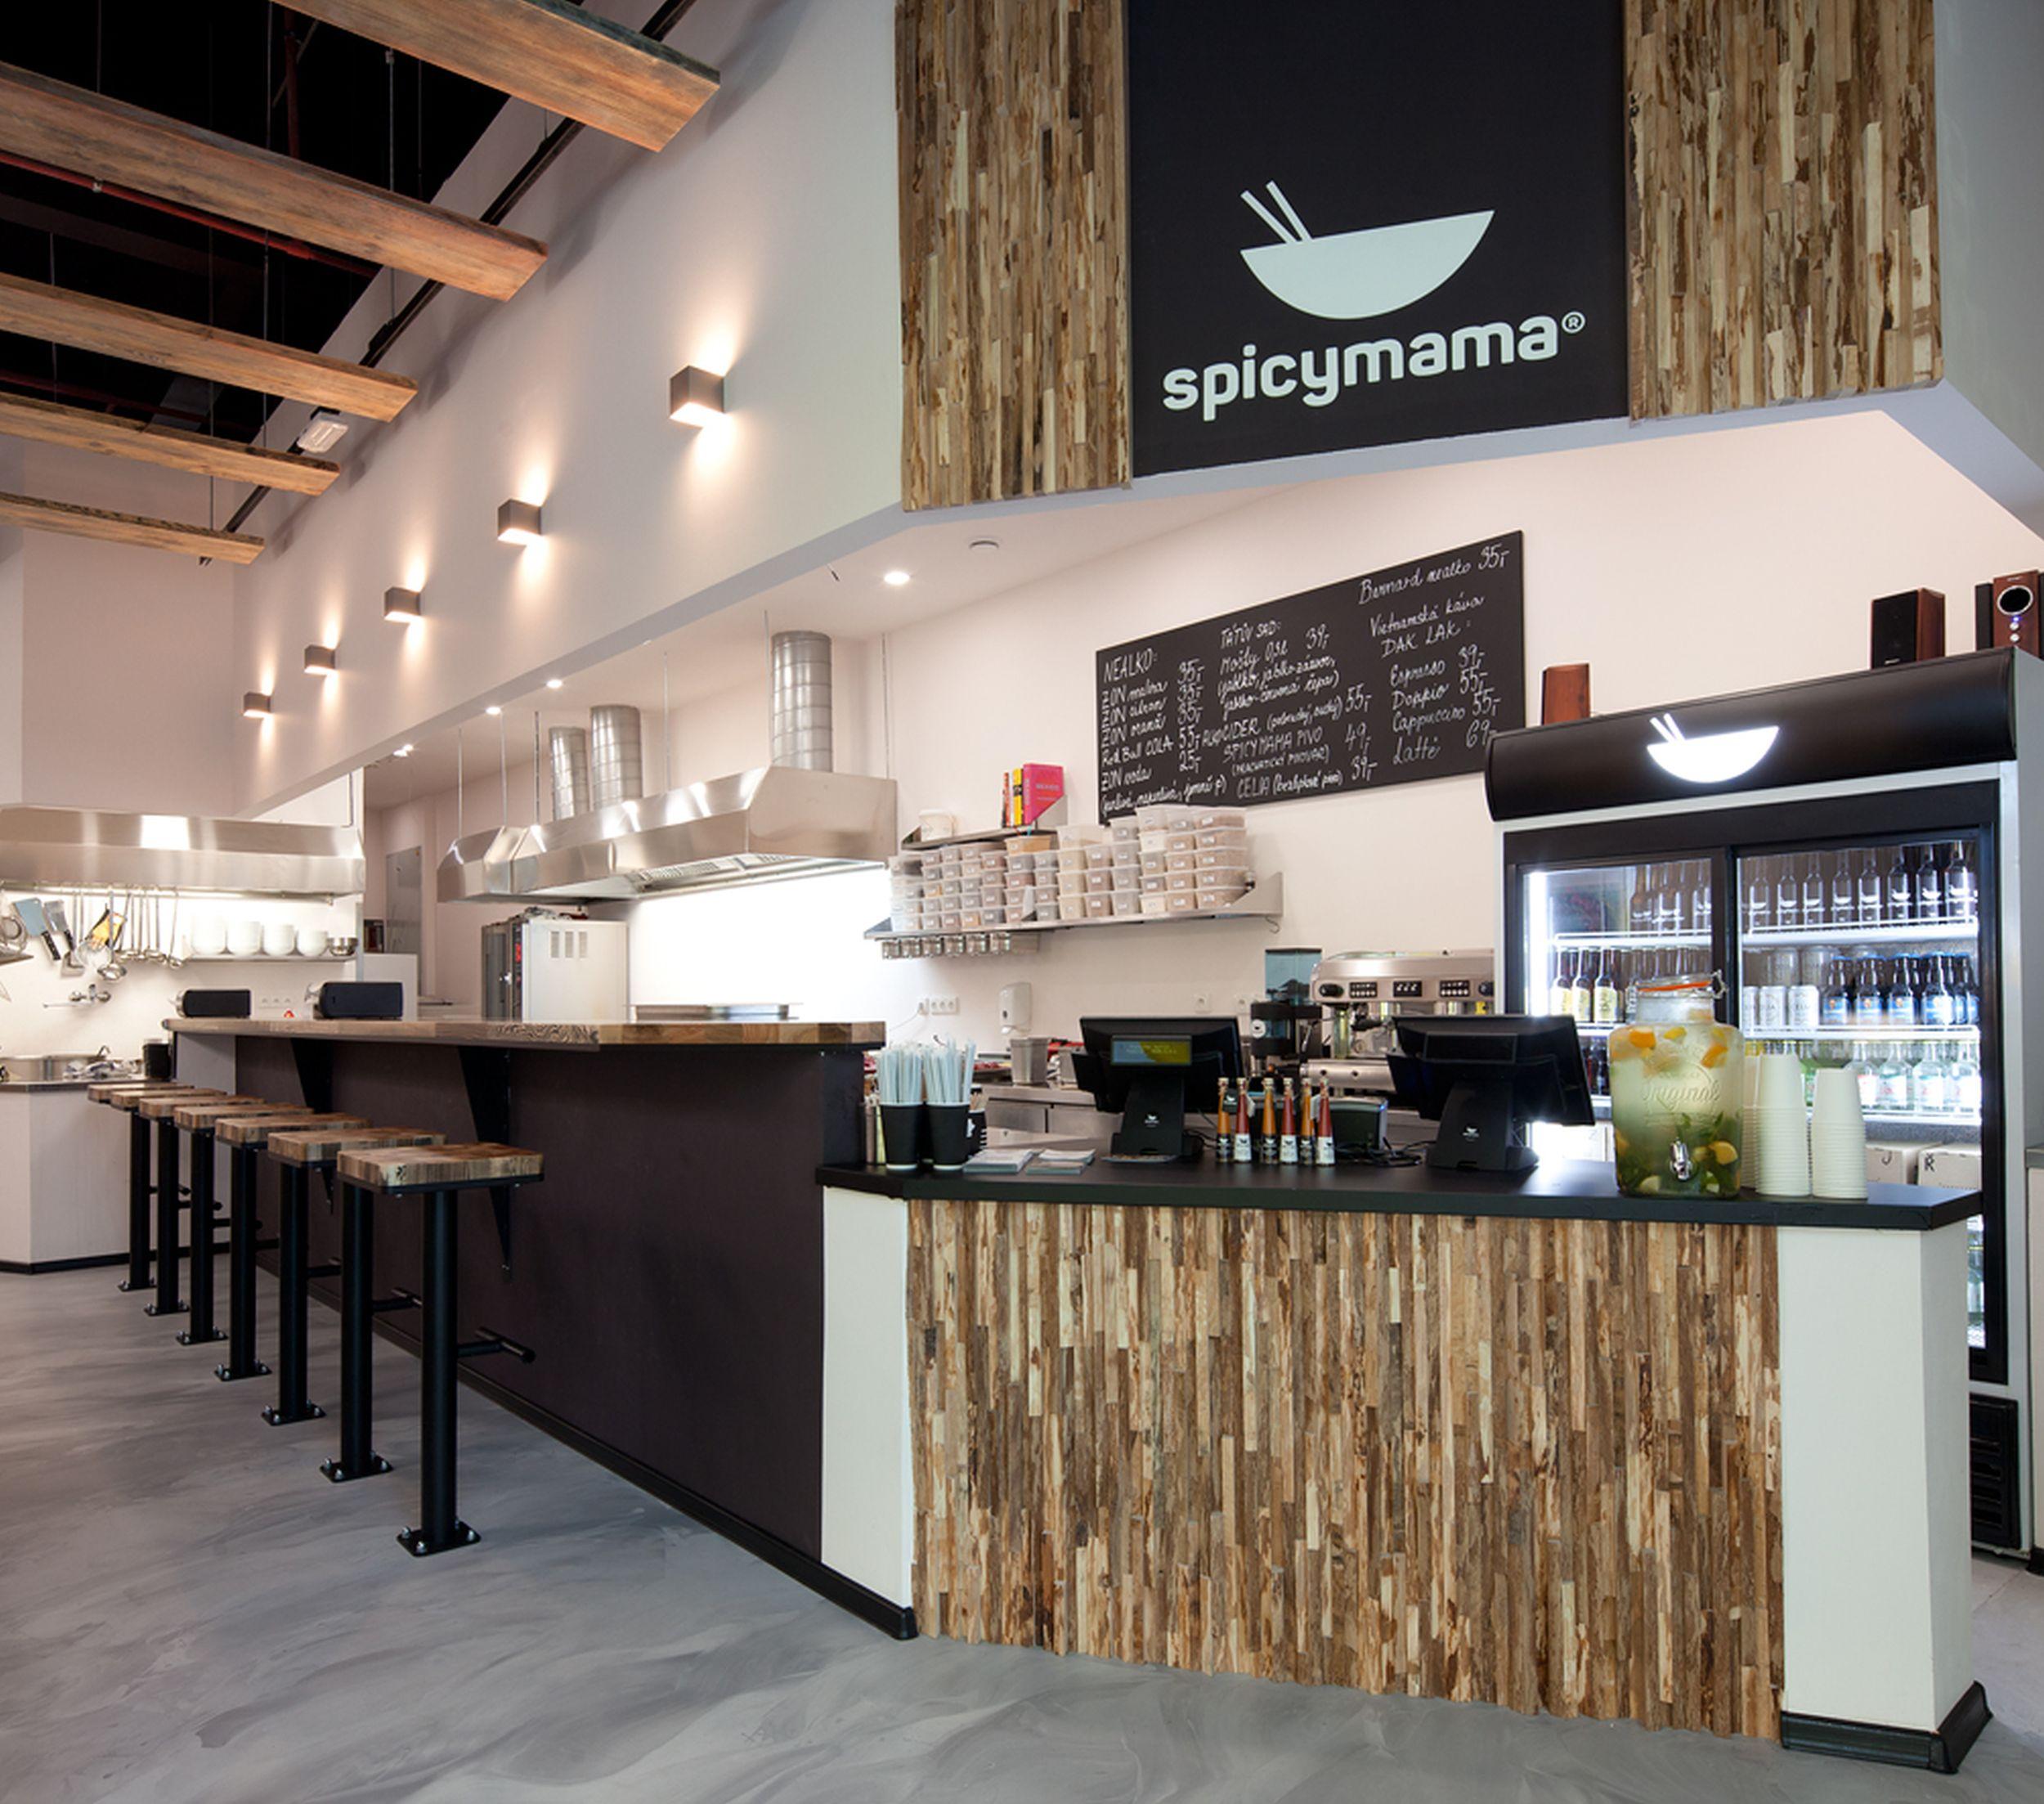 Tipy a zajímavosti / Bistro Spicymama v Centru Černý Most